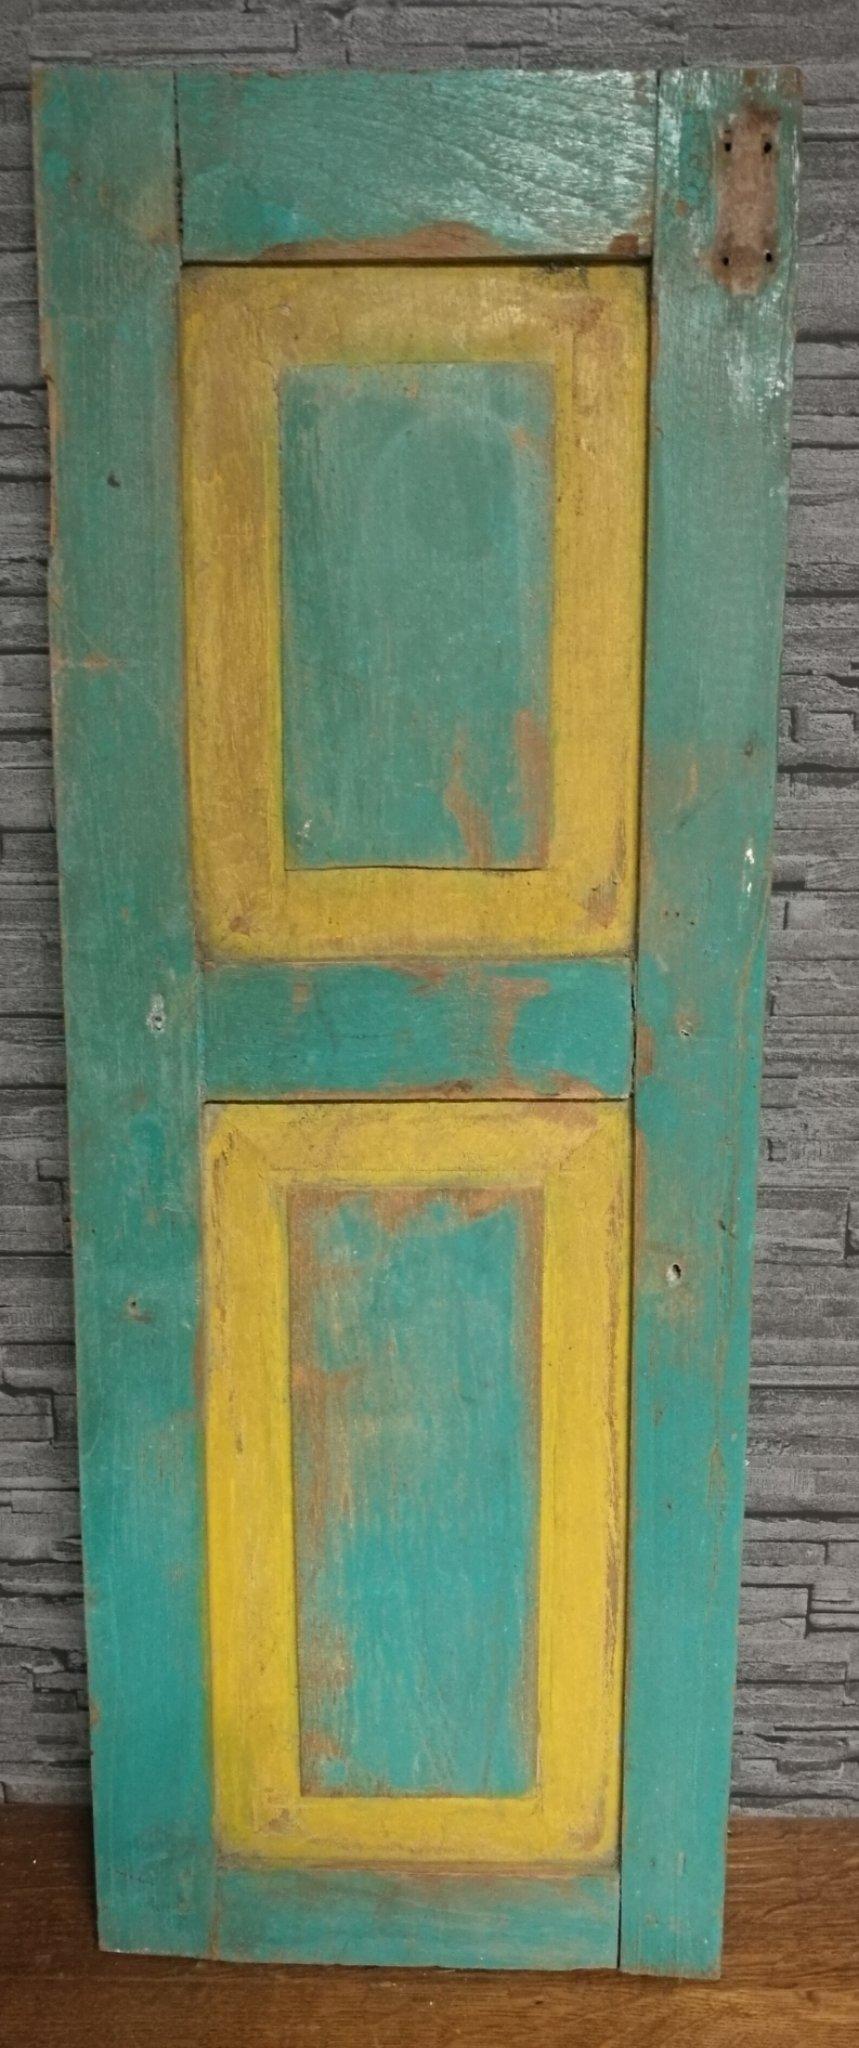 Oude houten deur#2 01165